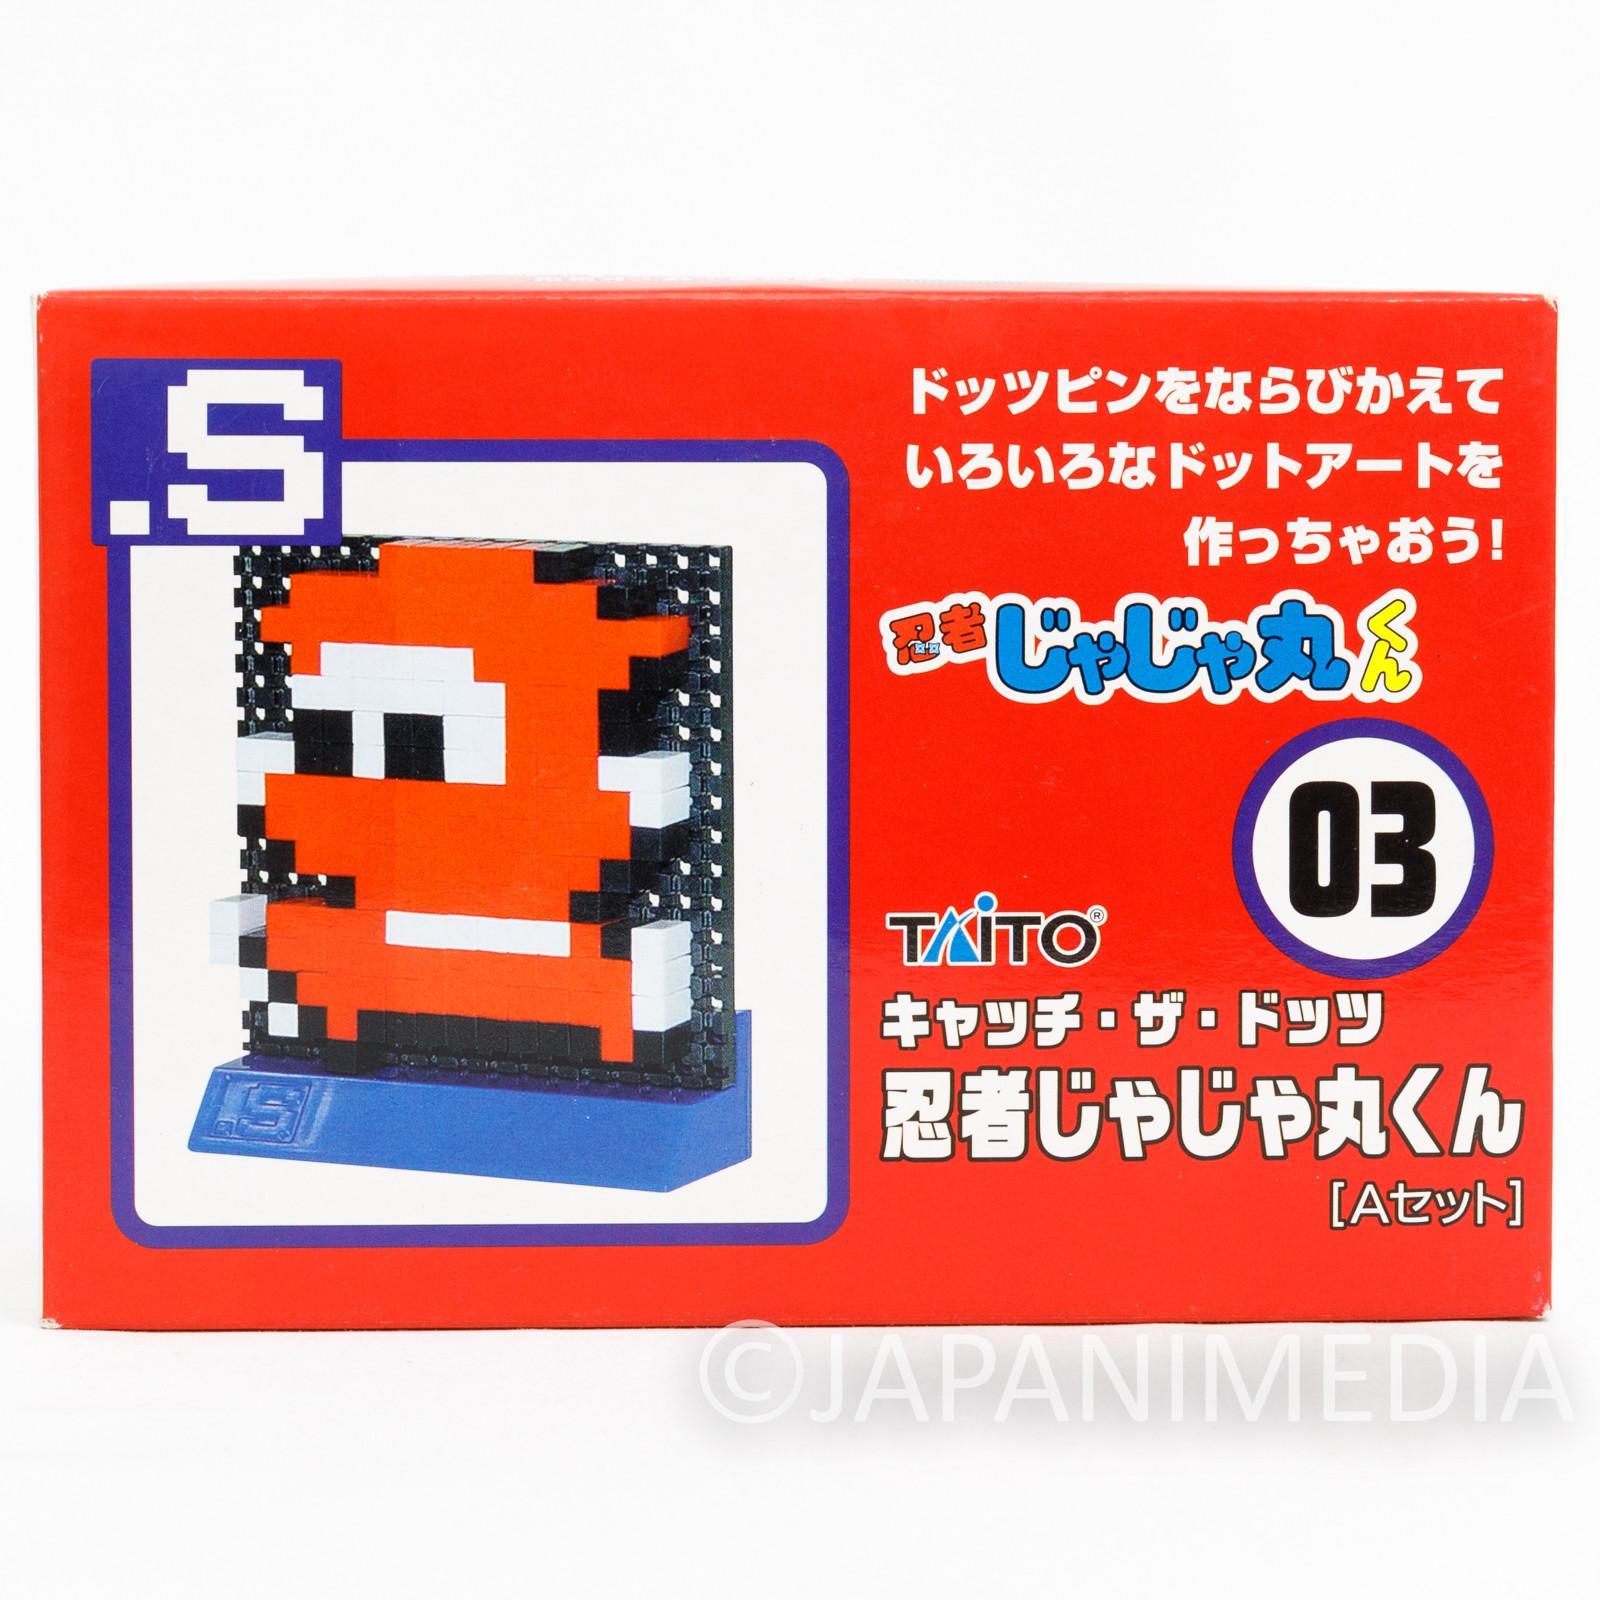 RARE! Ninja Jajamaru Kun A Dots .S Puzzle Pin Panel Toy Taito JAPAN FAMICOM